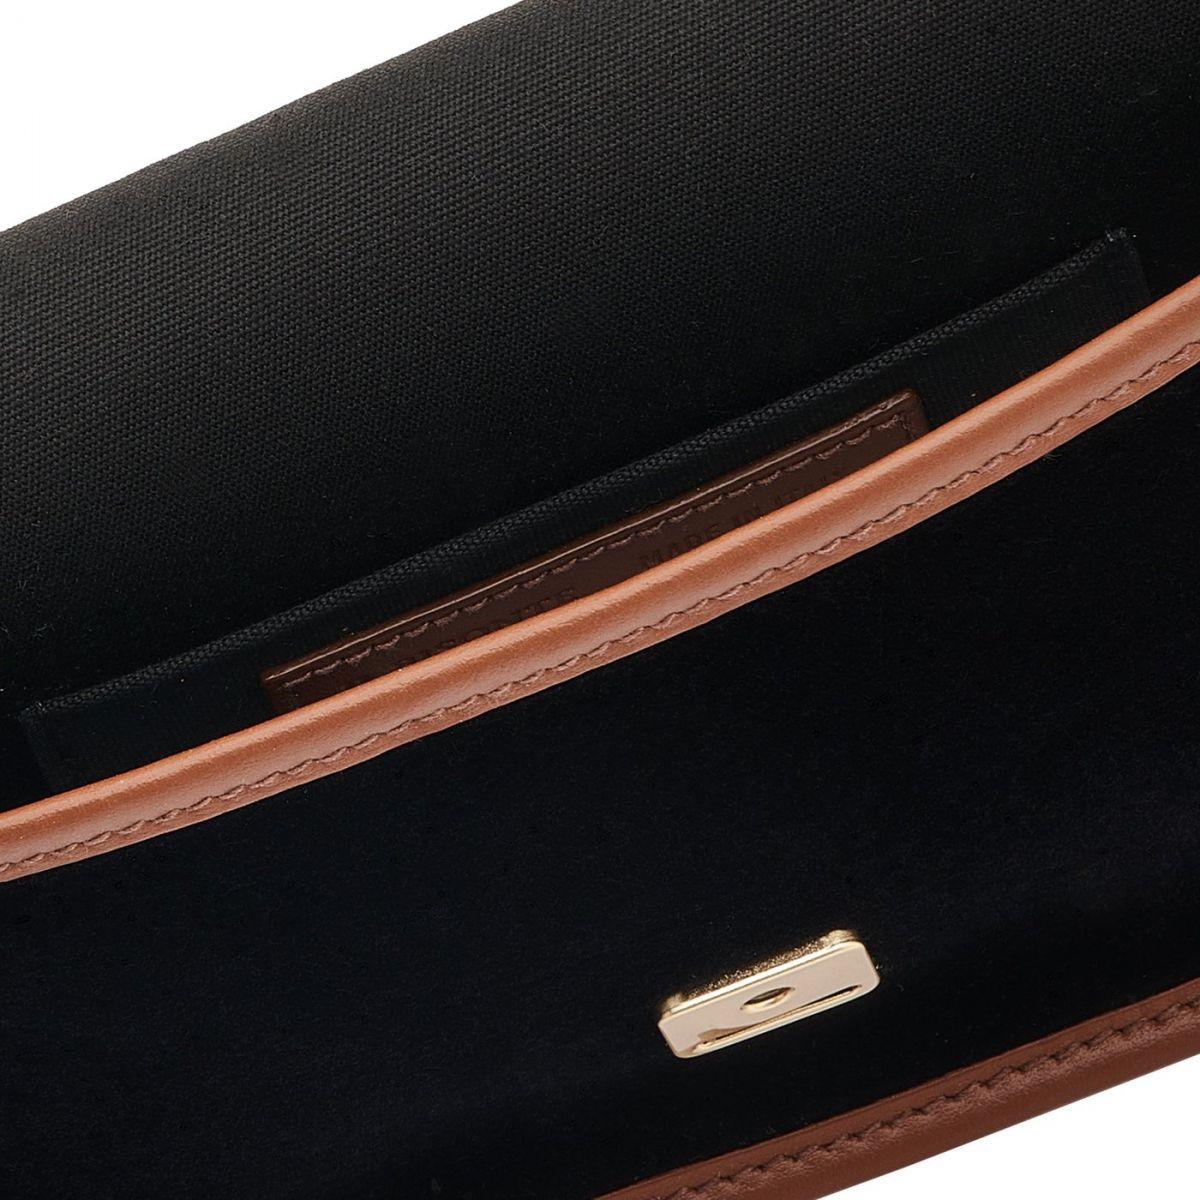 Luisa - Women's Shoulder Bag in Velvet/Calf Leather color Black/Tobacco - Simmetria line BSH133 | Details